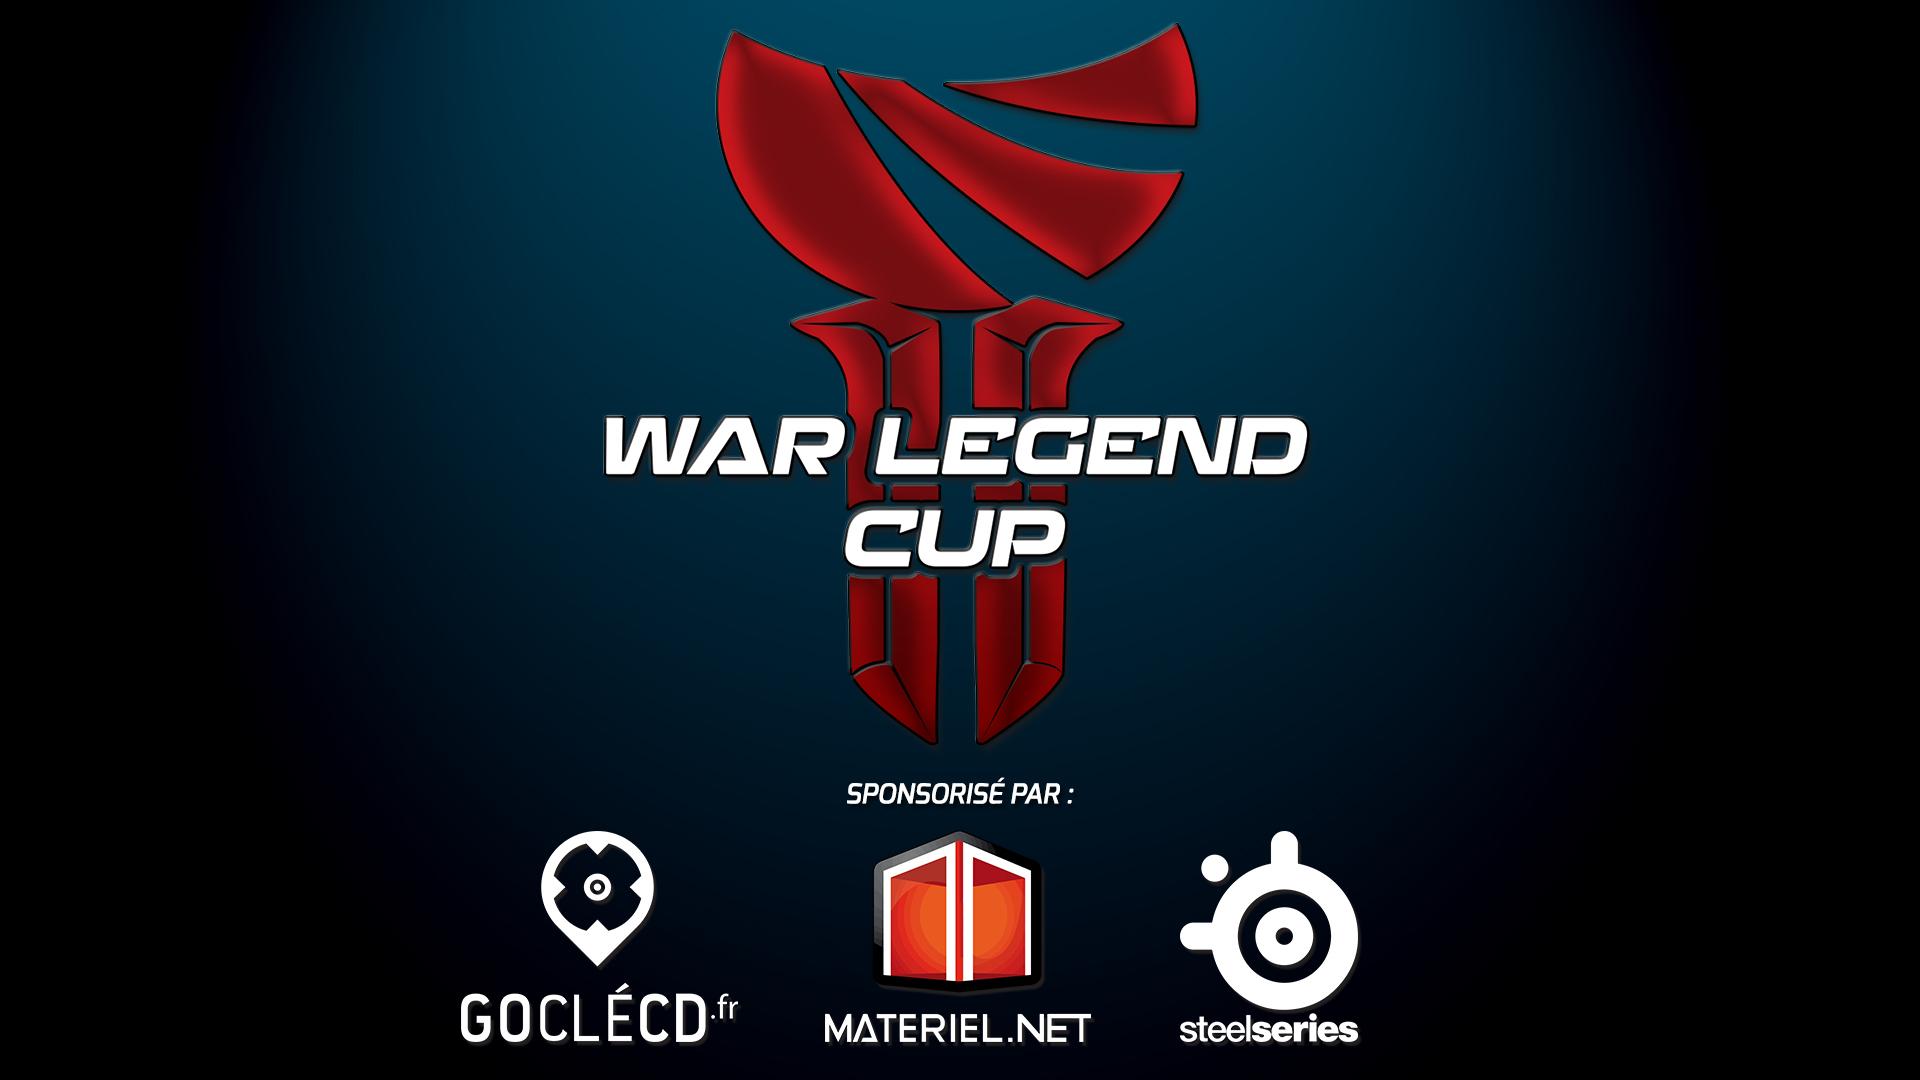 WarLegendCup Sponsors